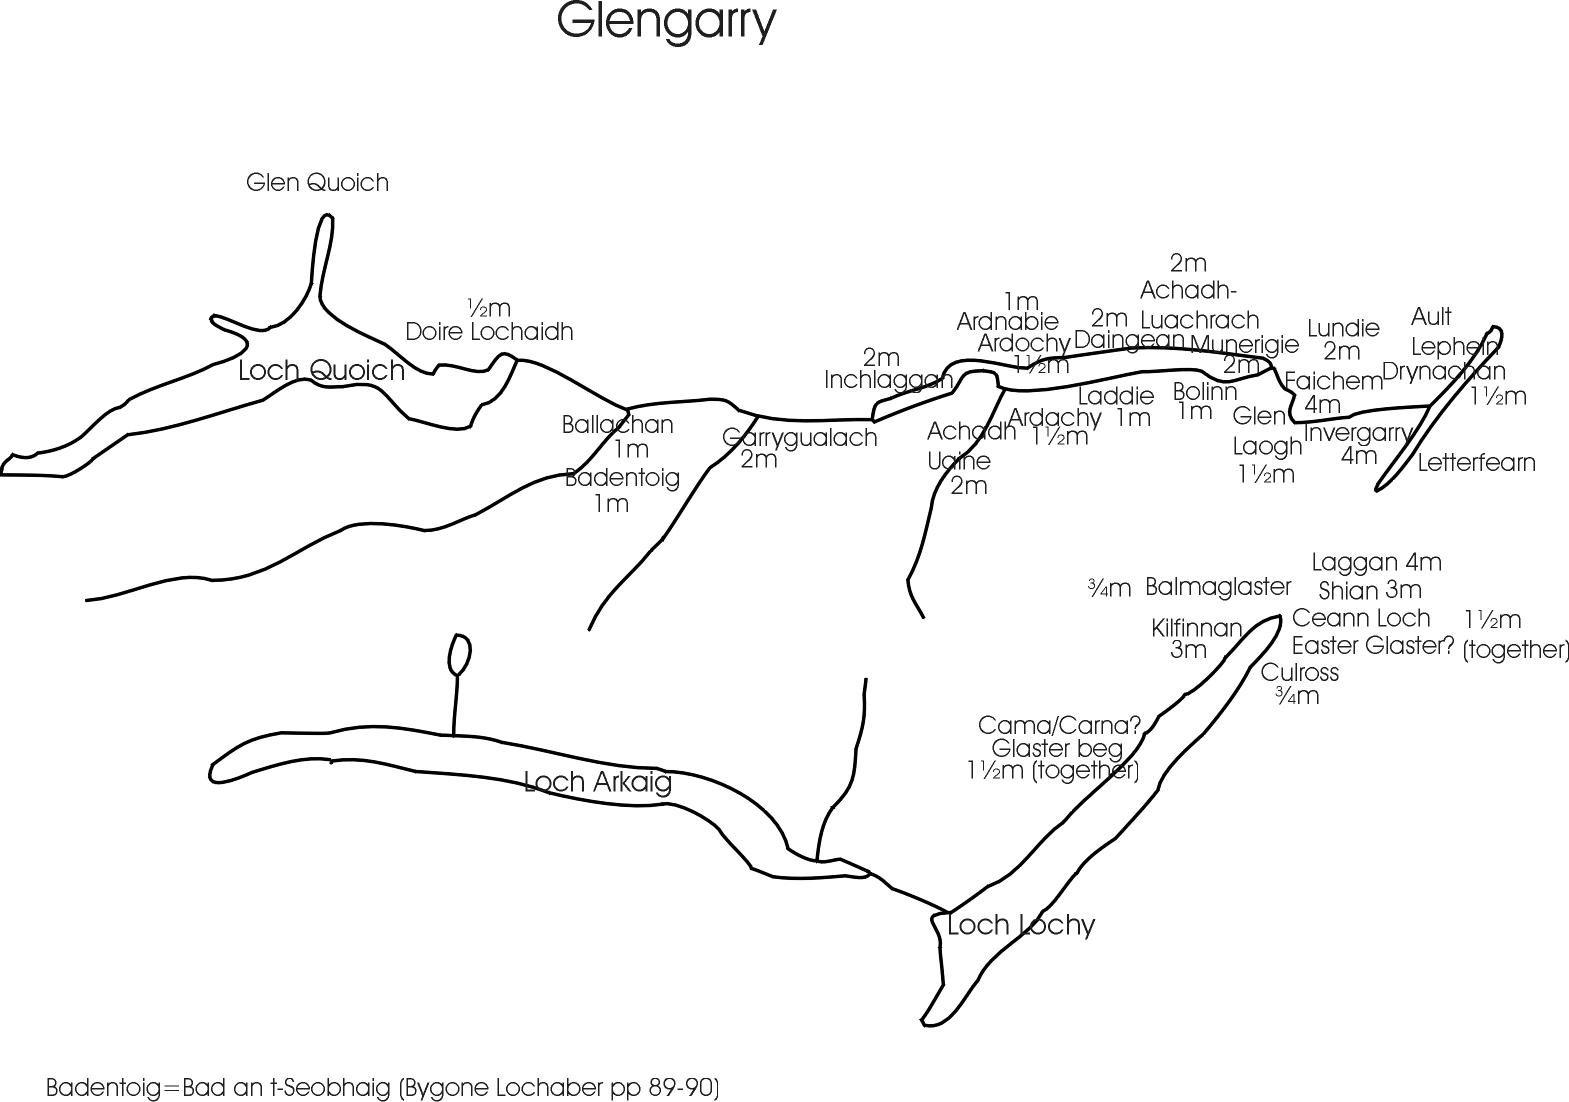 Glengarrymap